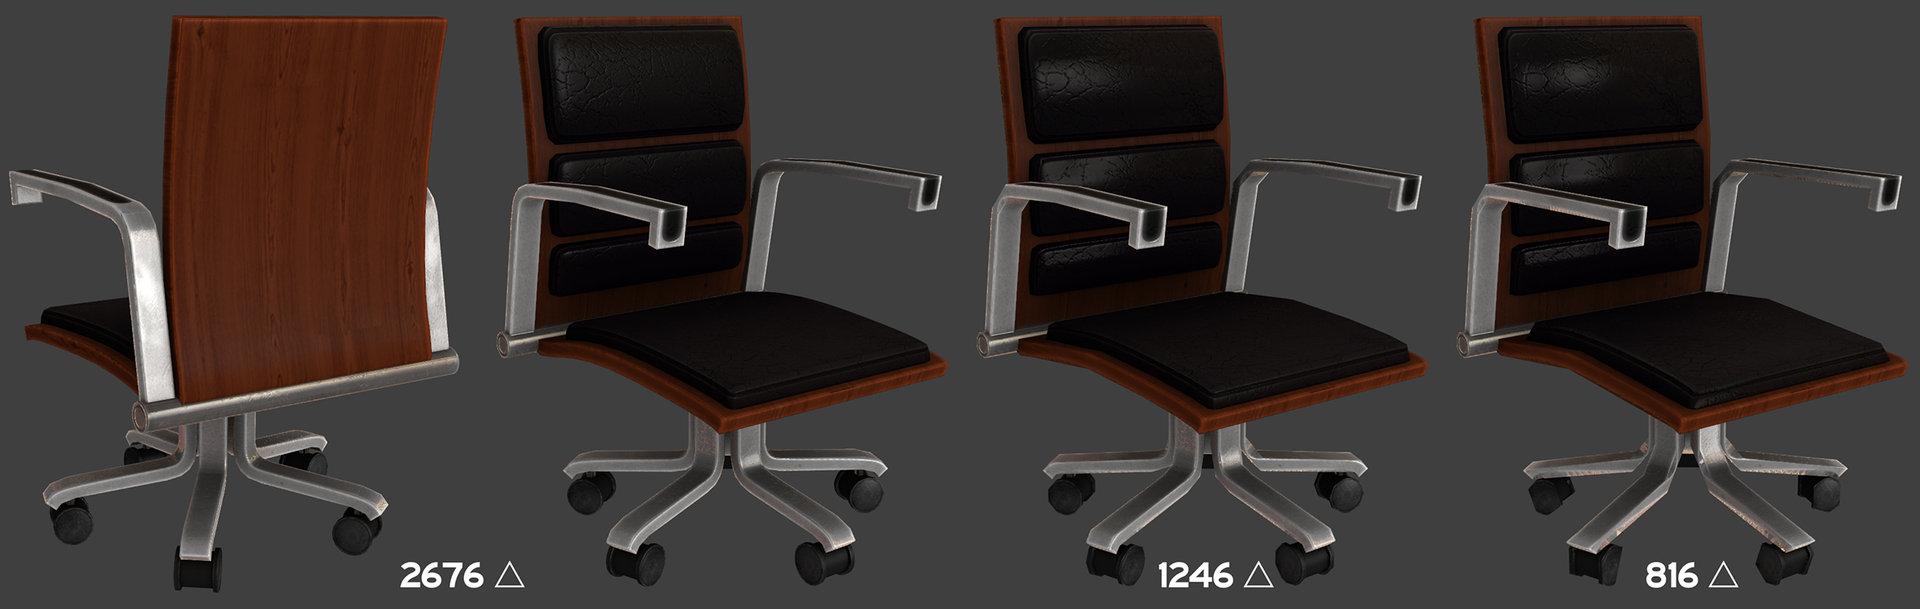 Ben bickle chair lods